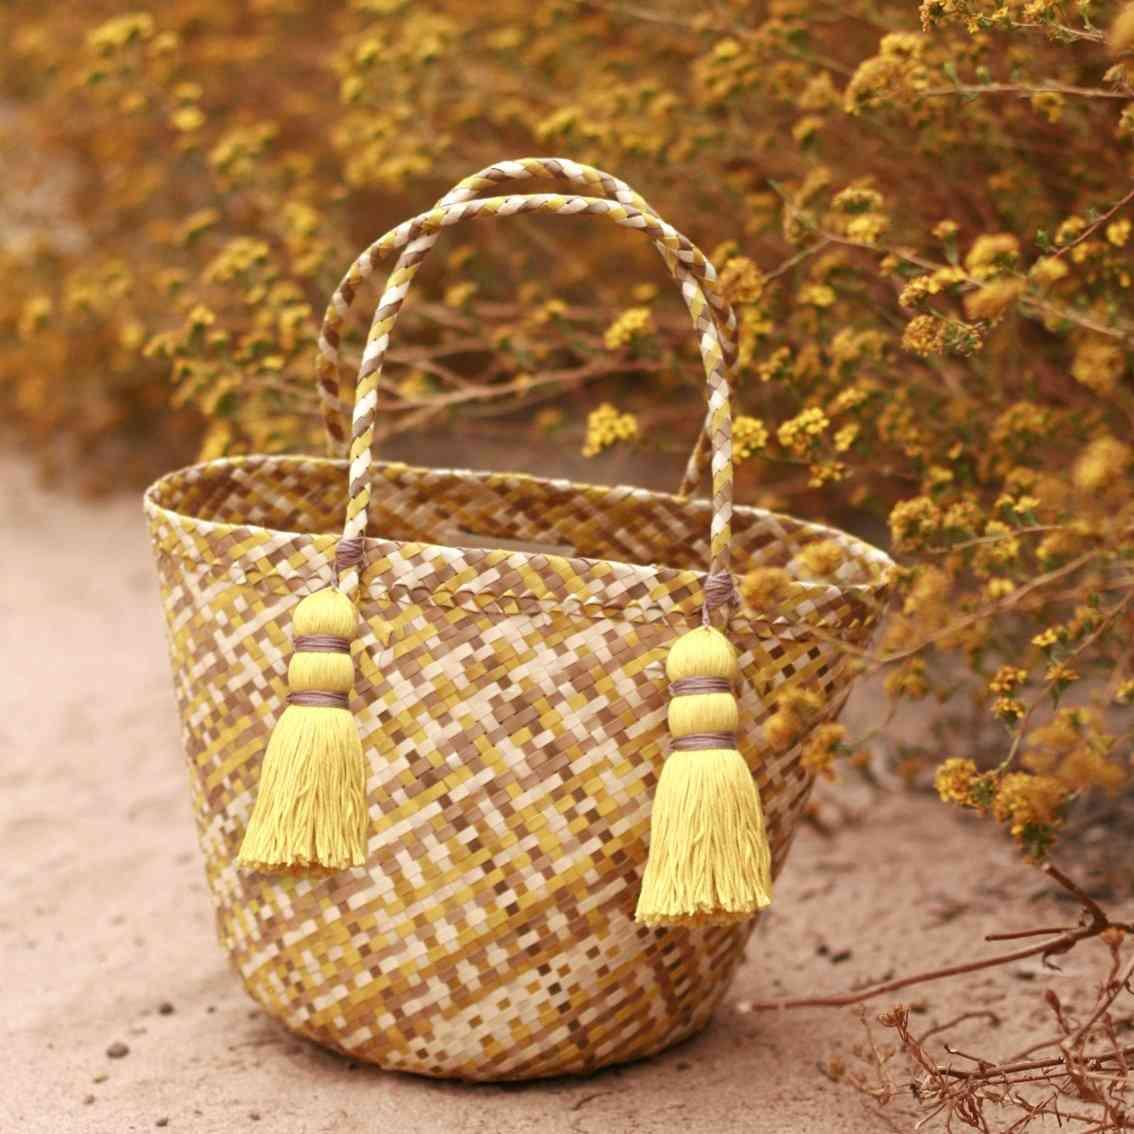 Coco Palm Straw Bag